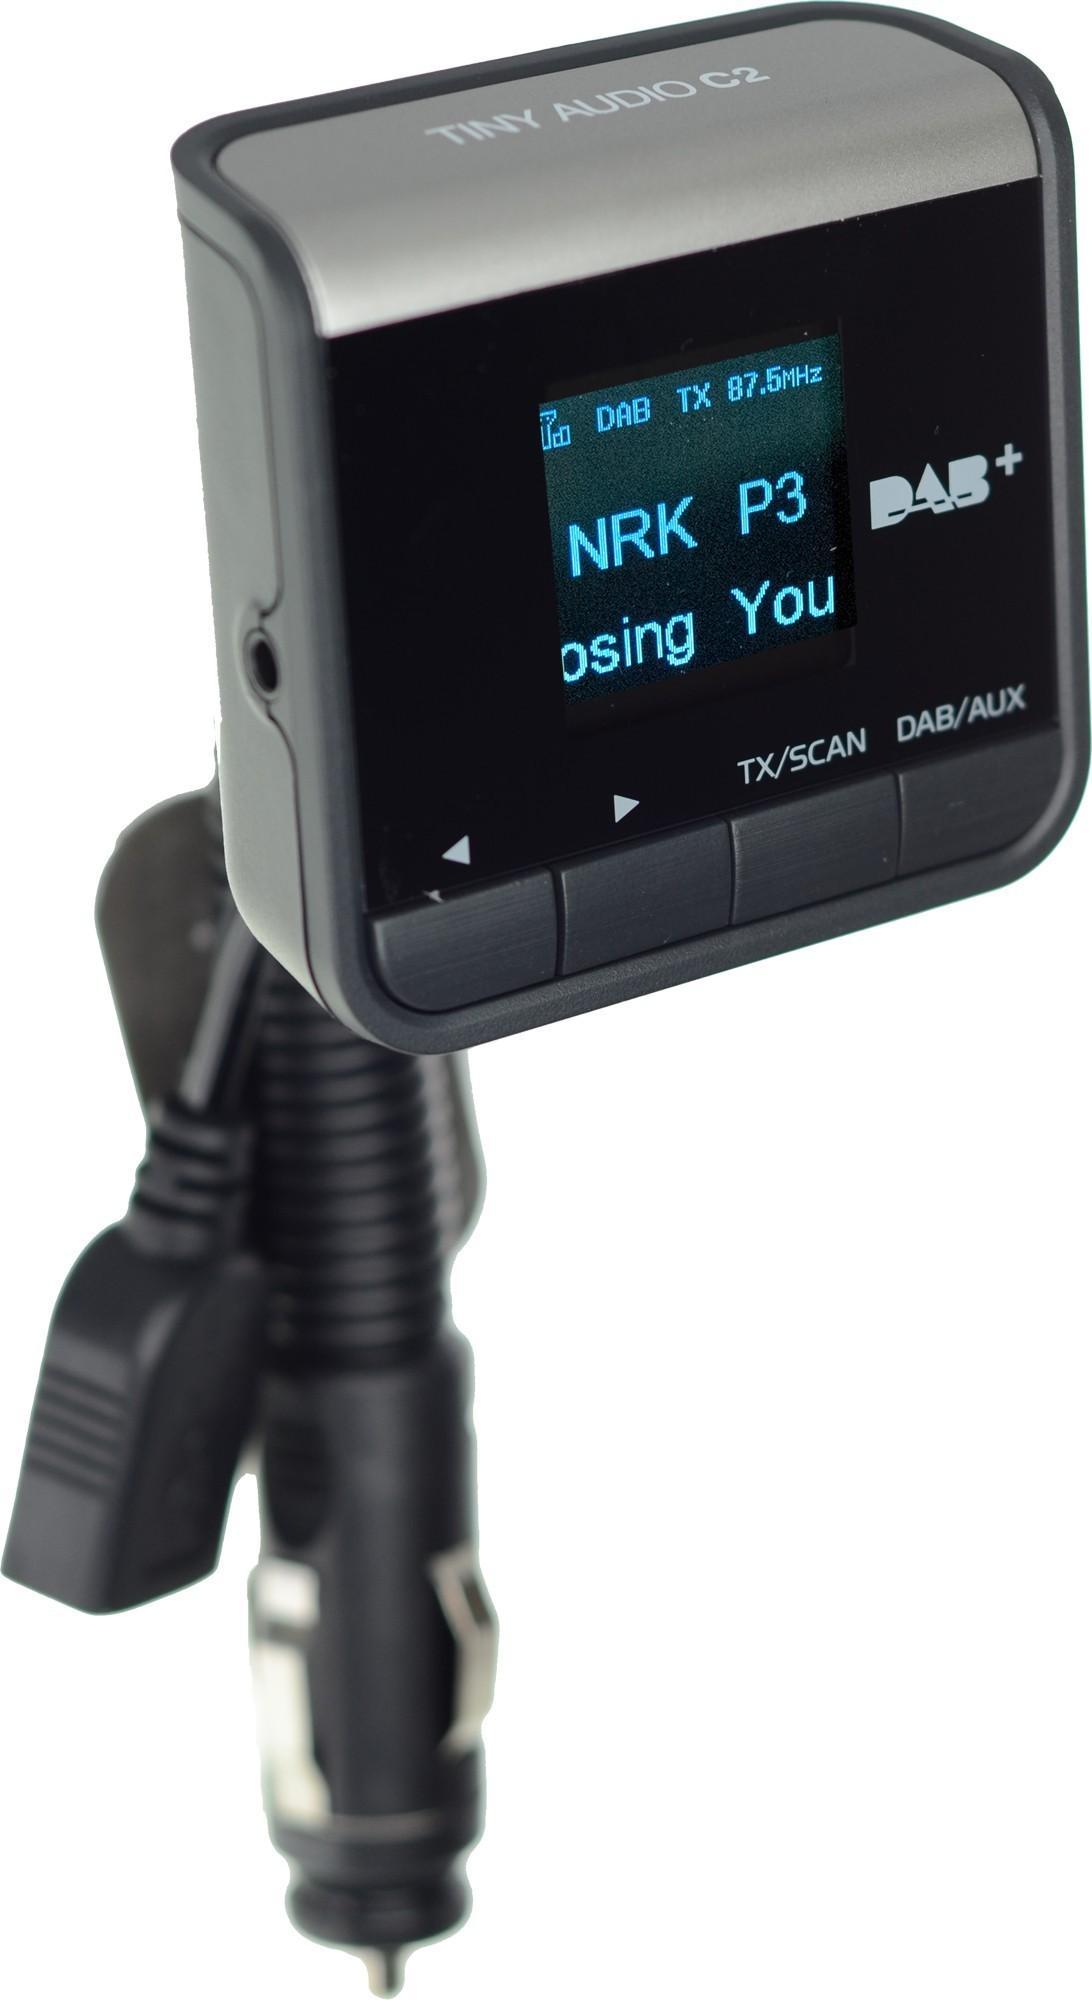 Ryddig Best pris på DAB-adapter, dab radio til bil, bilradio - Se priser BN-48